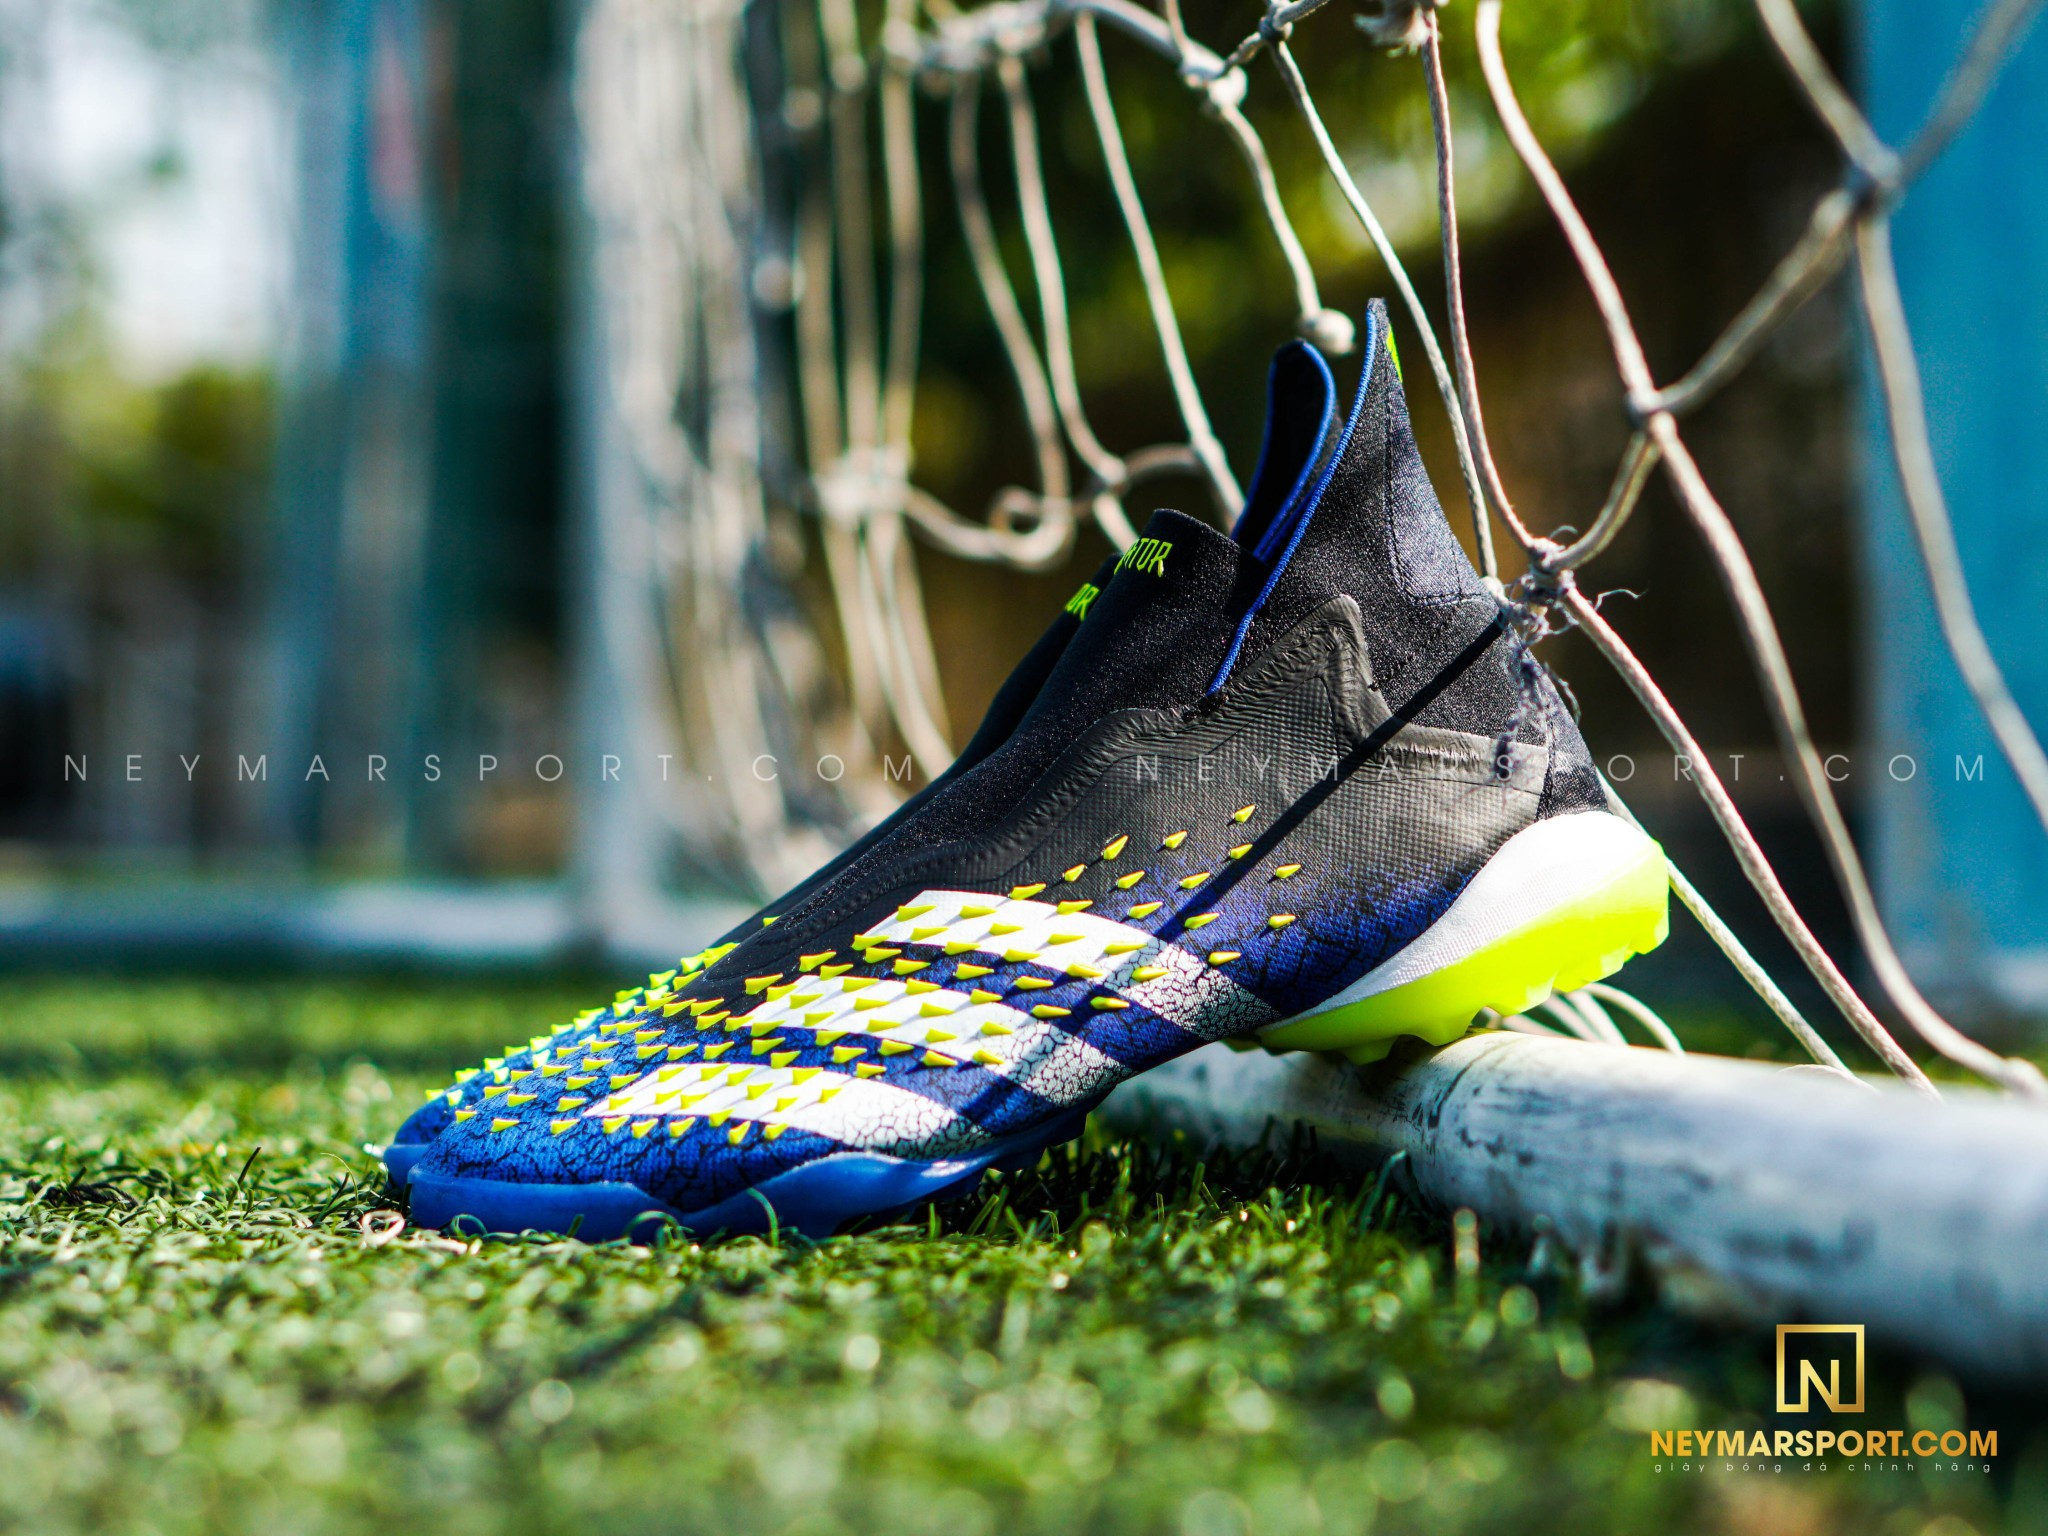 Giá bán của giày đá banh adidas Predator Freak Superlative